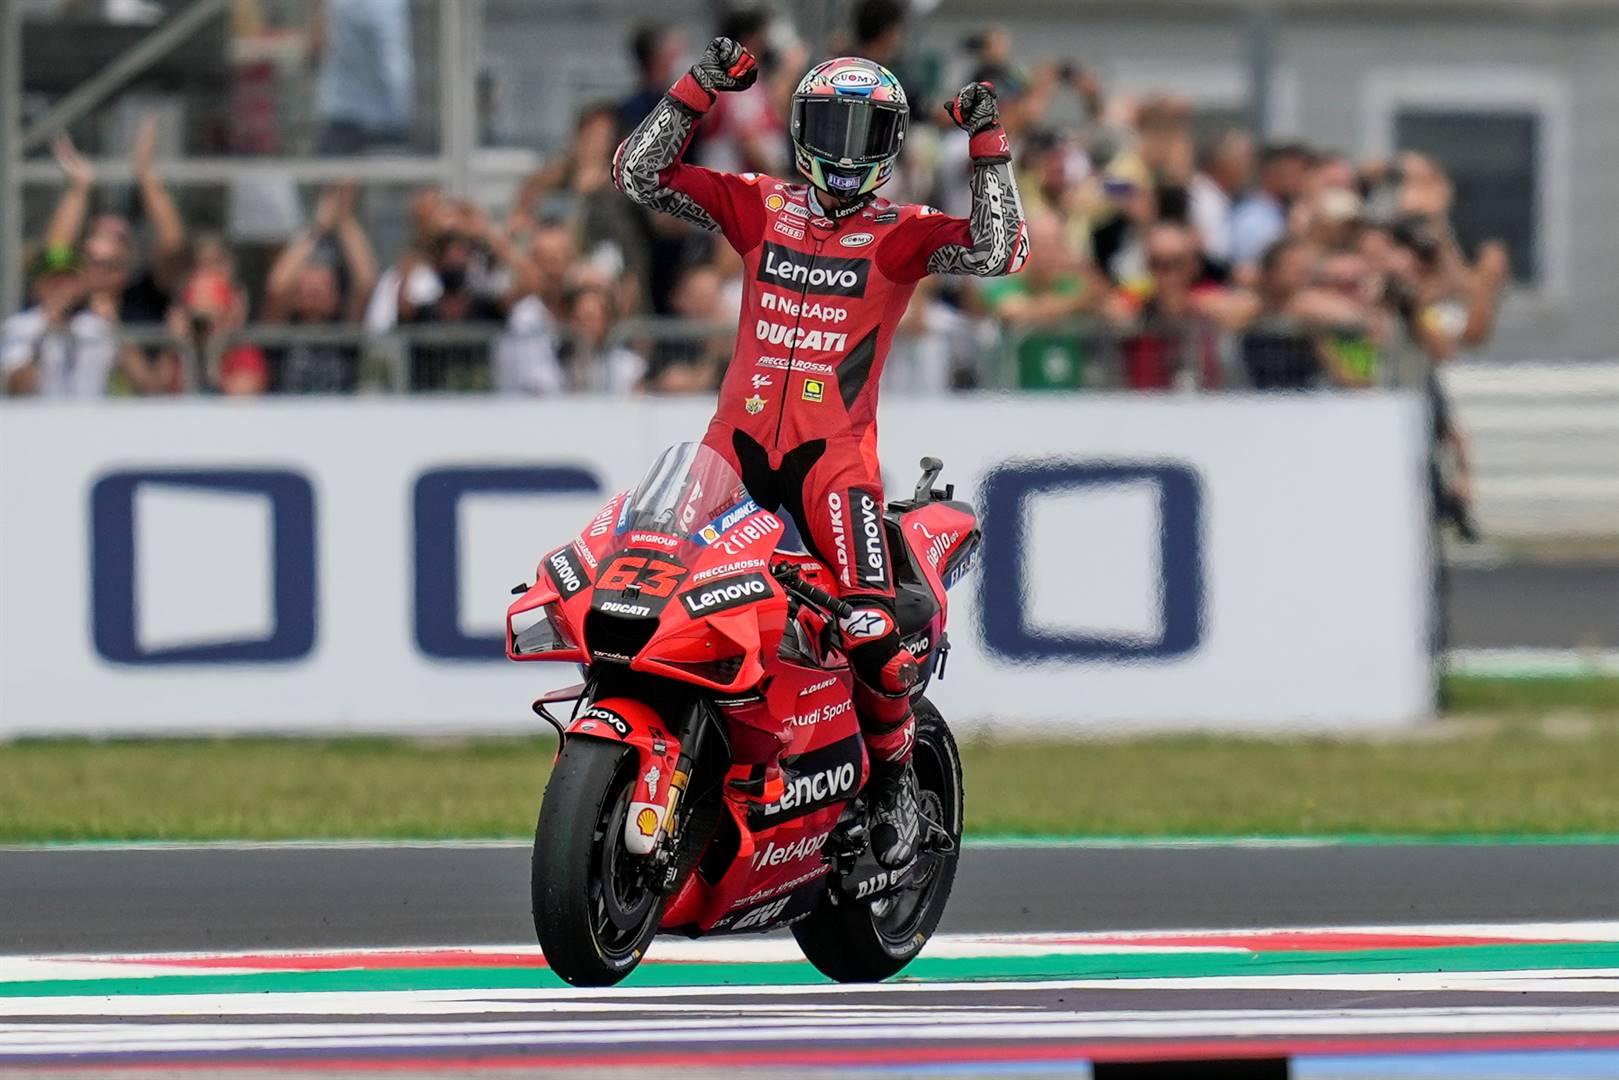 Francesco Bagnaia (Ducati) vier sy oorwinning in Sondag se San Marino-MotoGP in Misano, Italië. Foto: AP